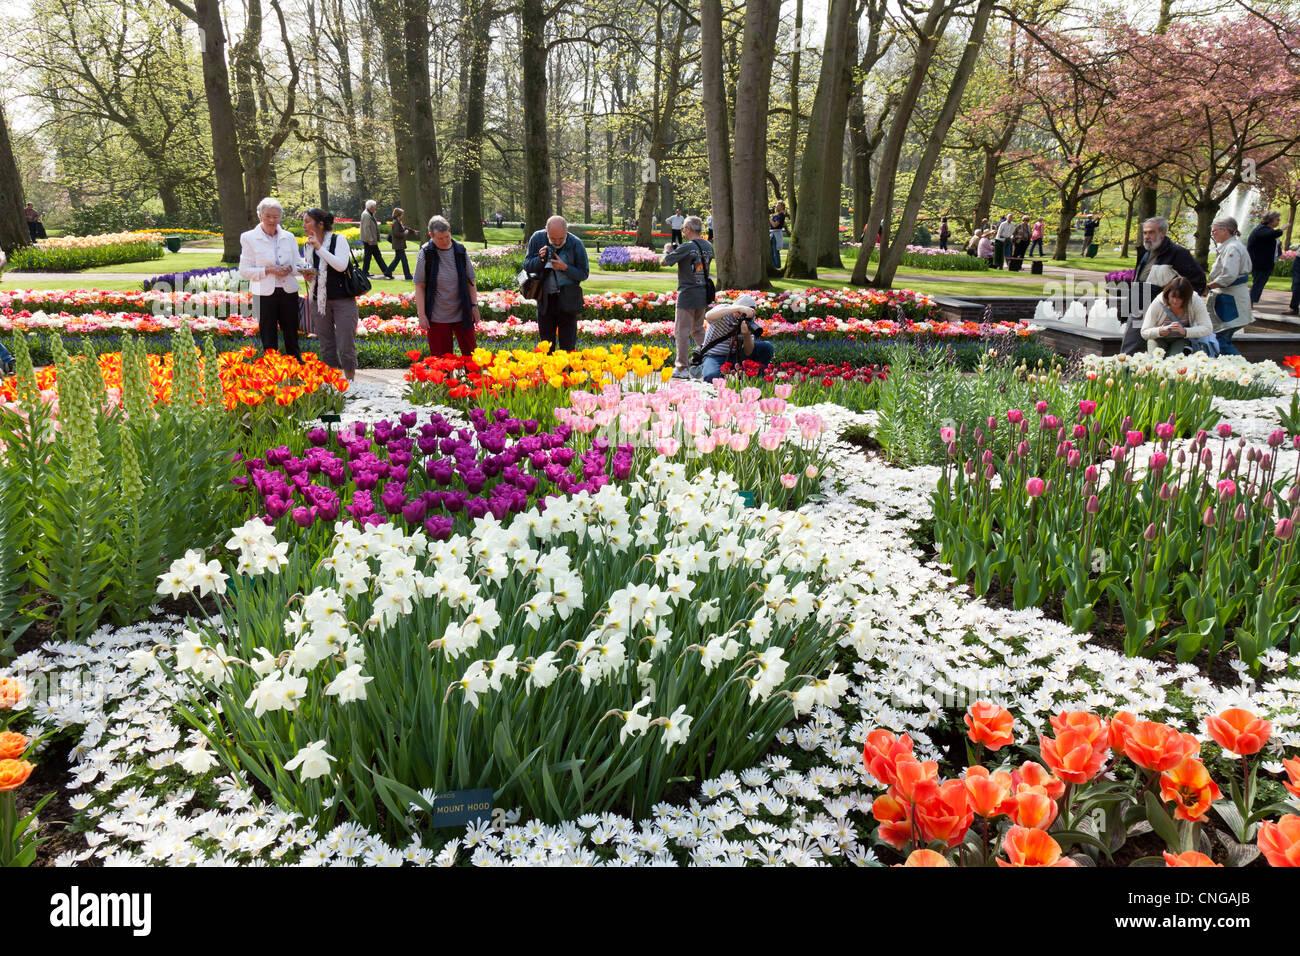 Holland, Keukenhof, flowerbed with tulips, daffodils, Anemone blanda (Grecian Windflower) and visitors. - Stock Image